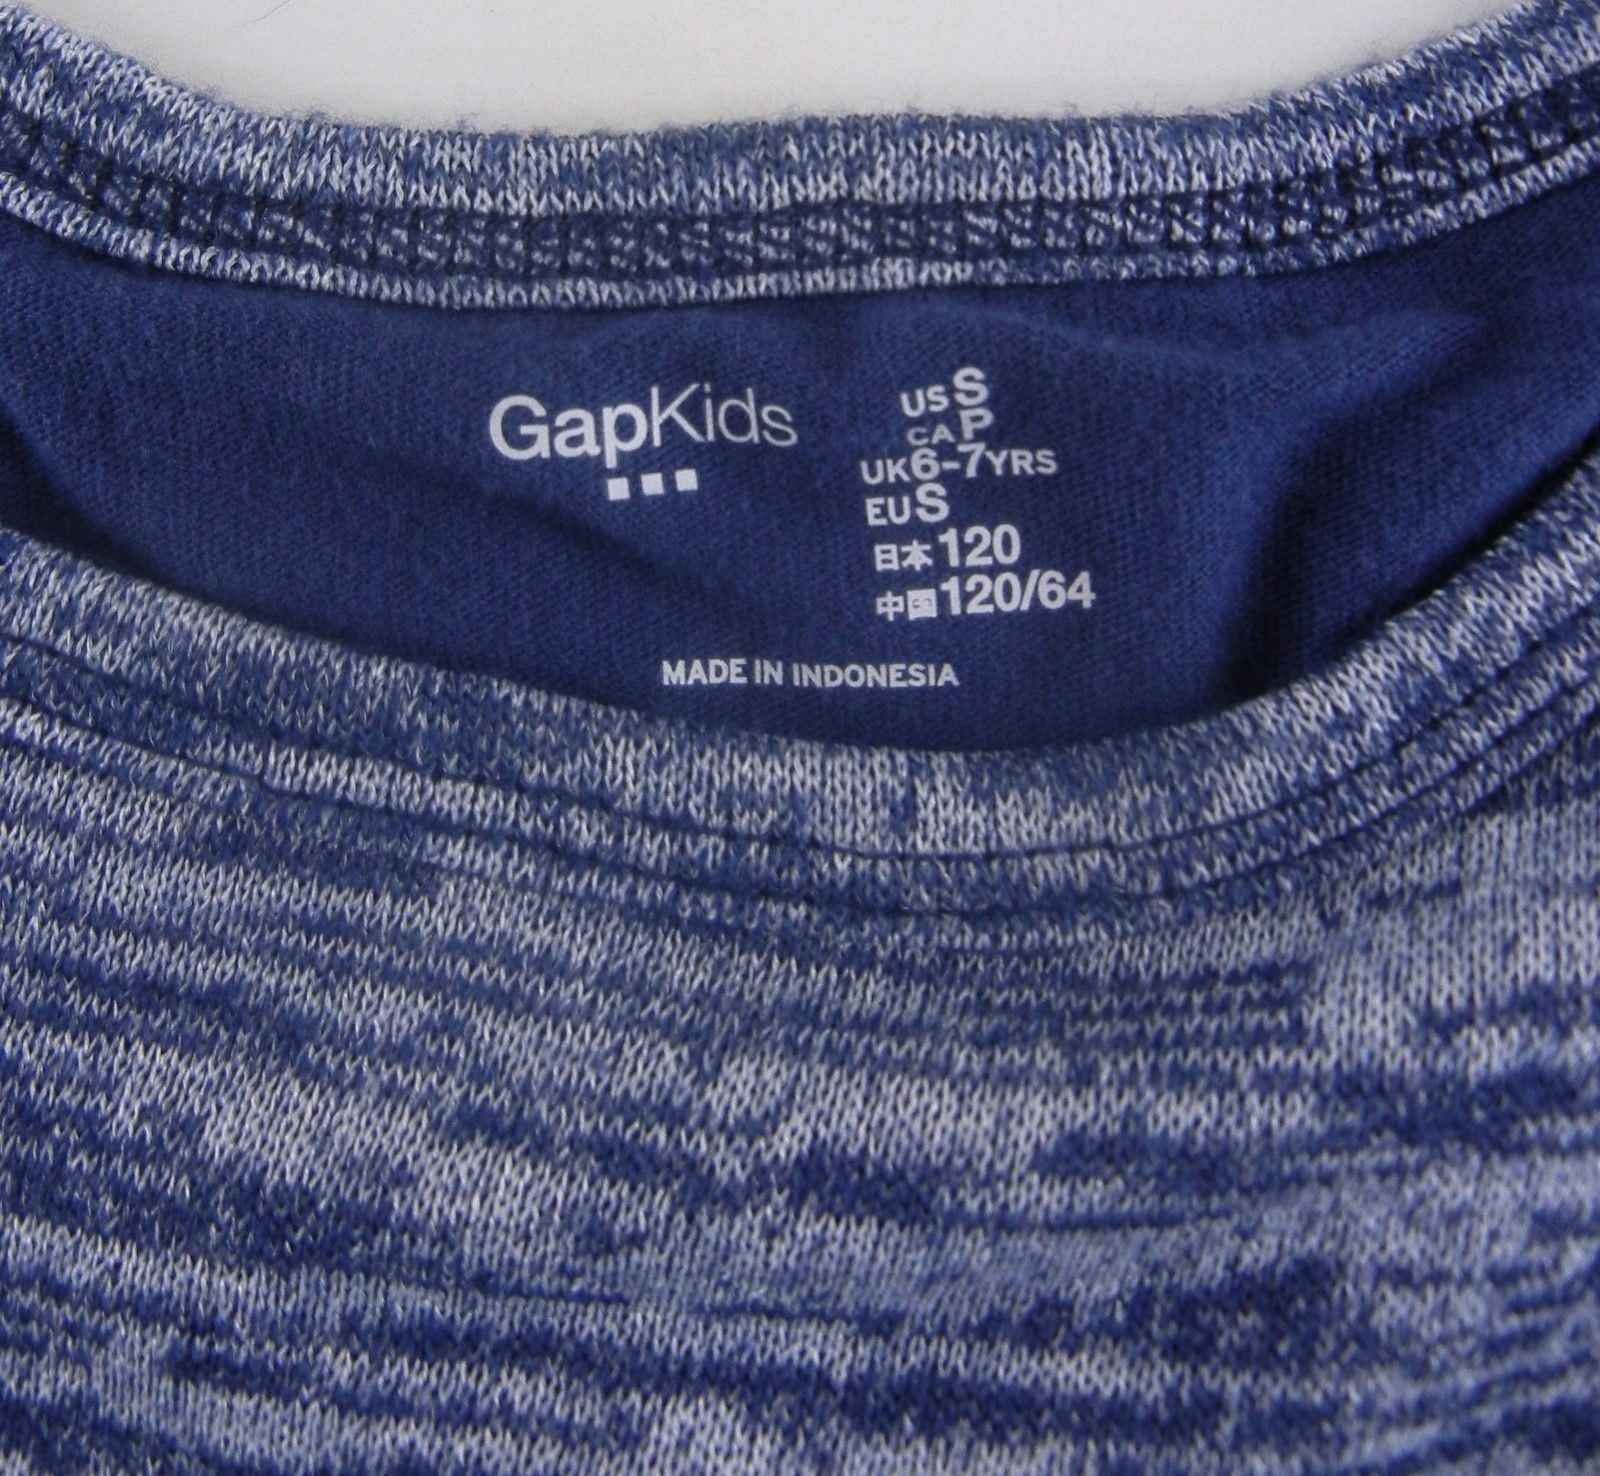 68b8ee4617c2a5 ... GAP KIDS Girl's Nurian Envelope Dutch Blue Knit Shirt Top S 6 7 yrs  Split ...